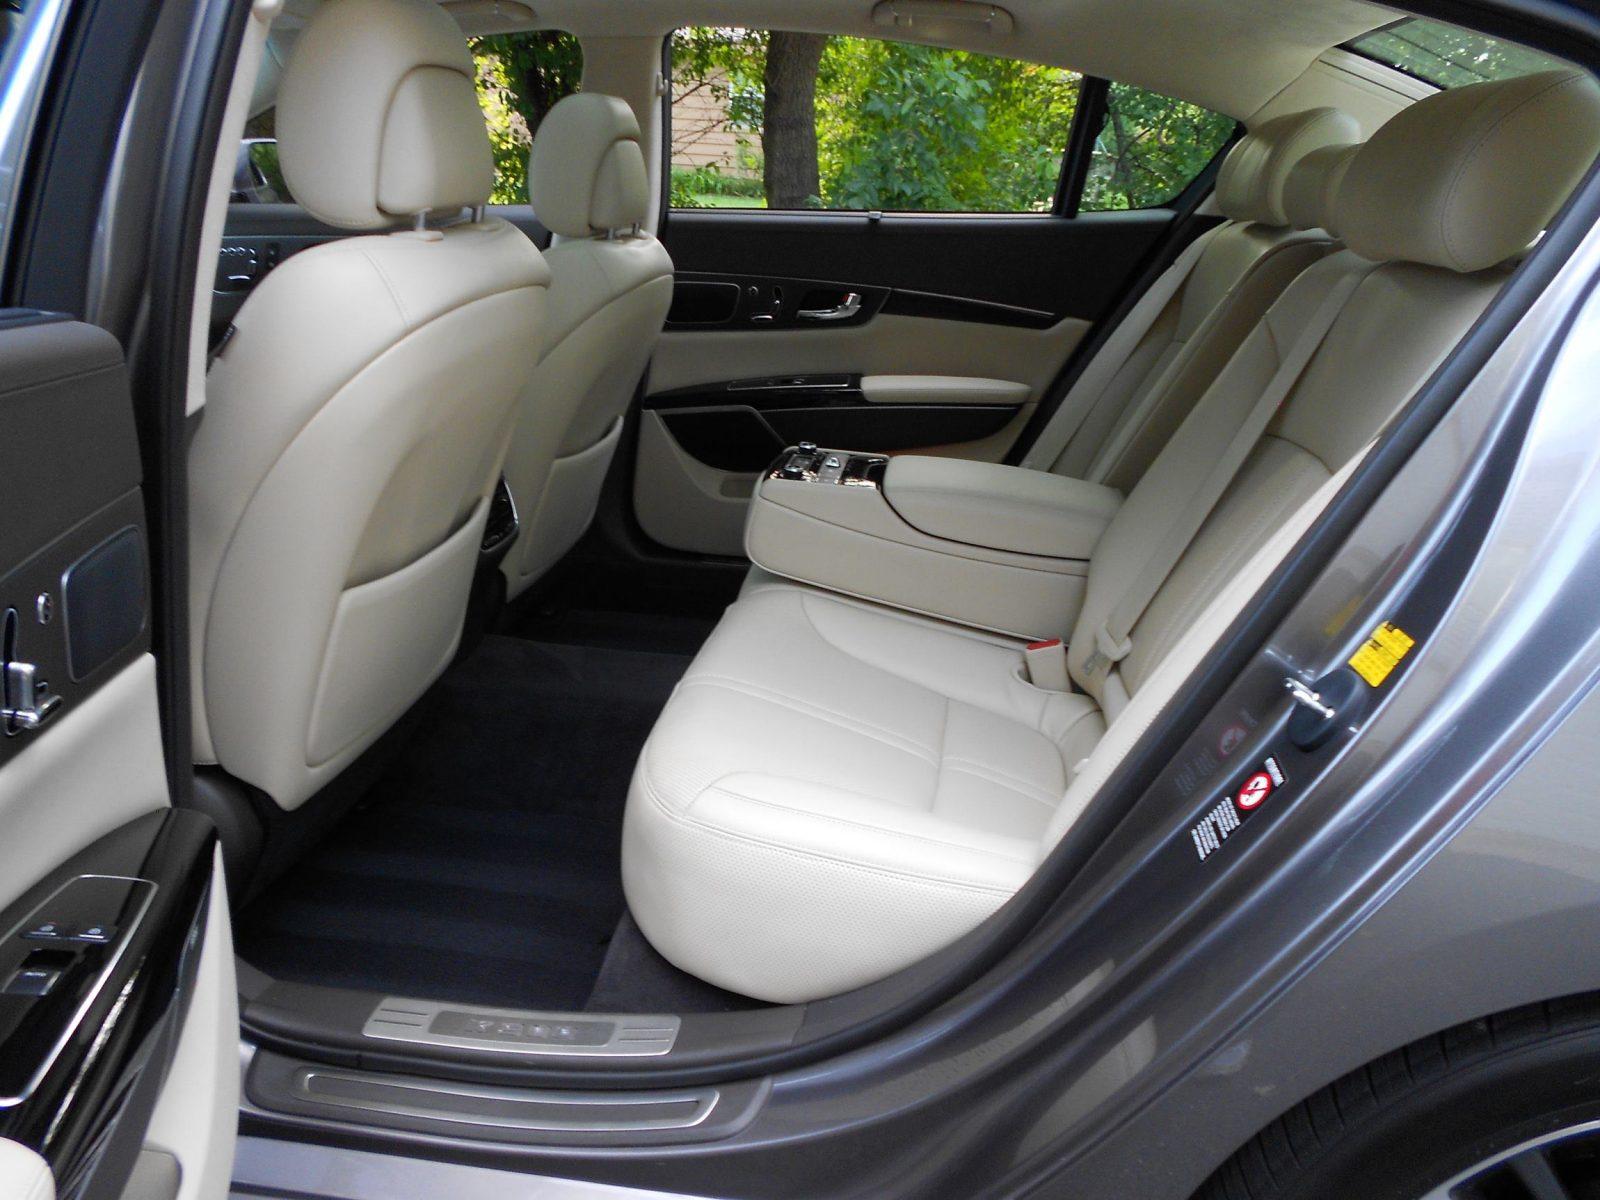 2016 kia k900 luxury interior photos ken glassman 2. Black Bedroom Furniture Sets. Home Design Ideas